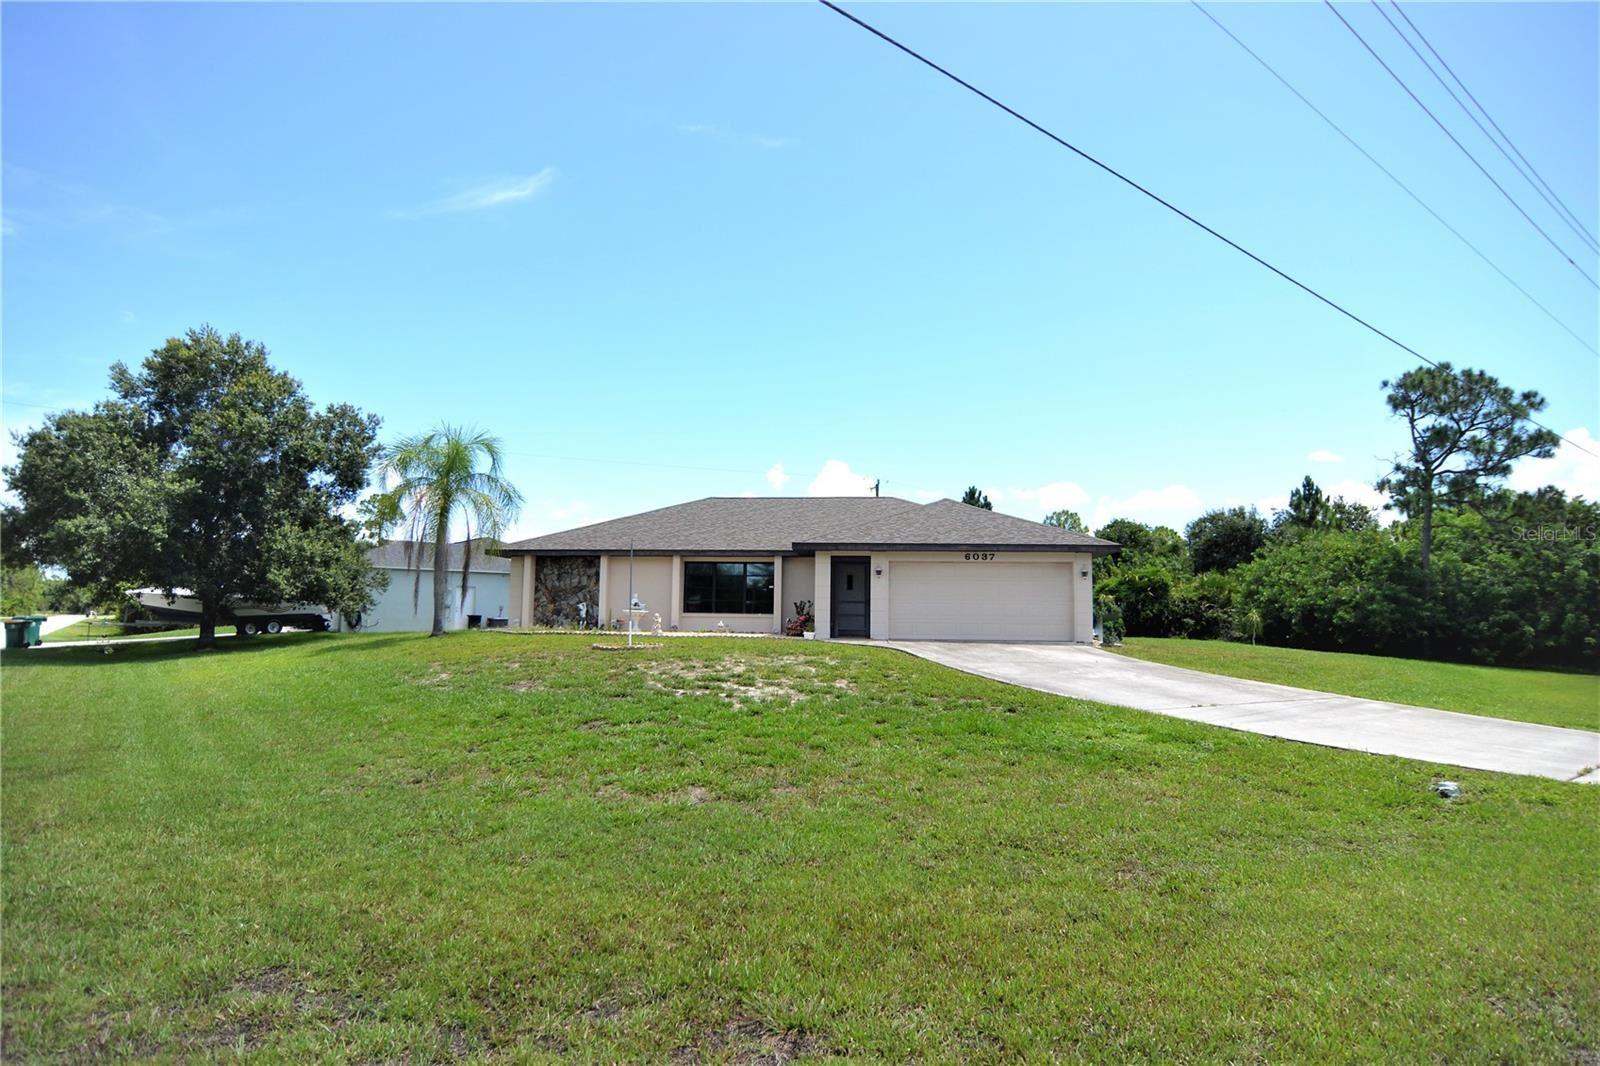 Photo of 6037 DAVID BOULEVARD, PORT CHARLOTTE, FL 33981 (MLS # C7446358)